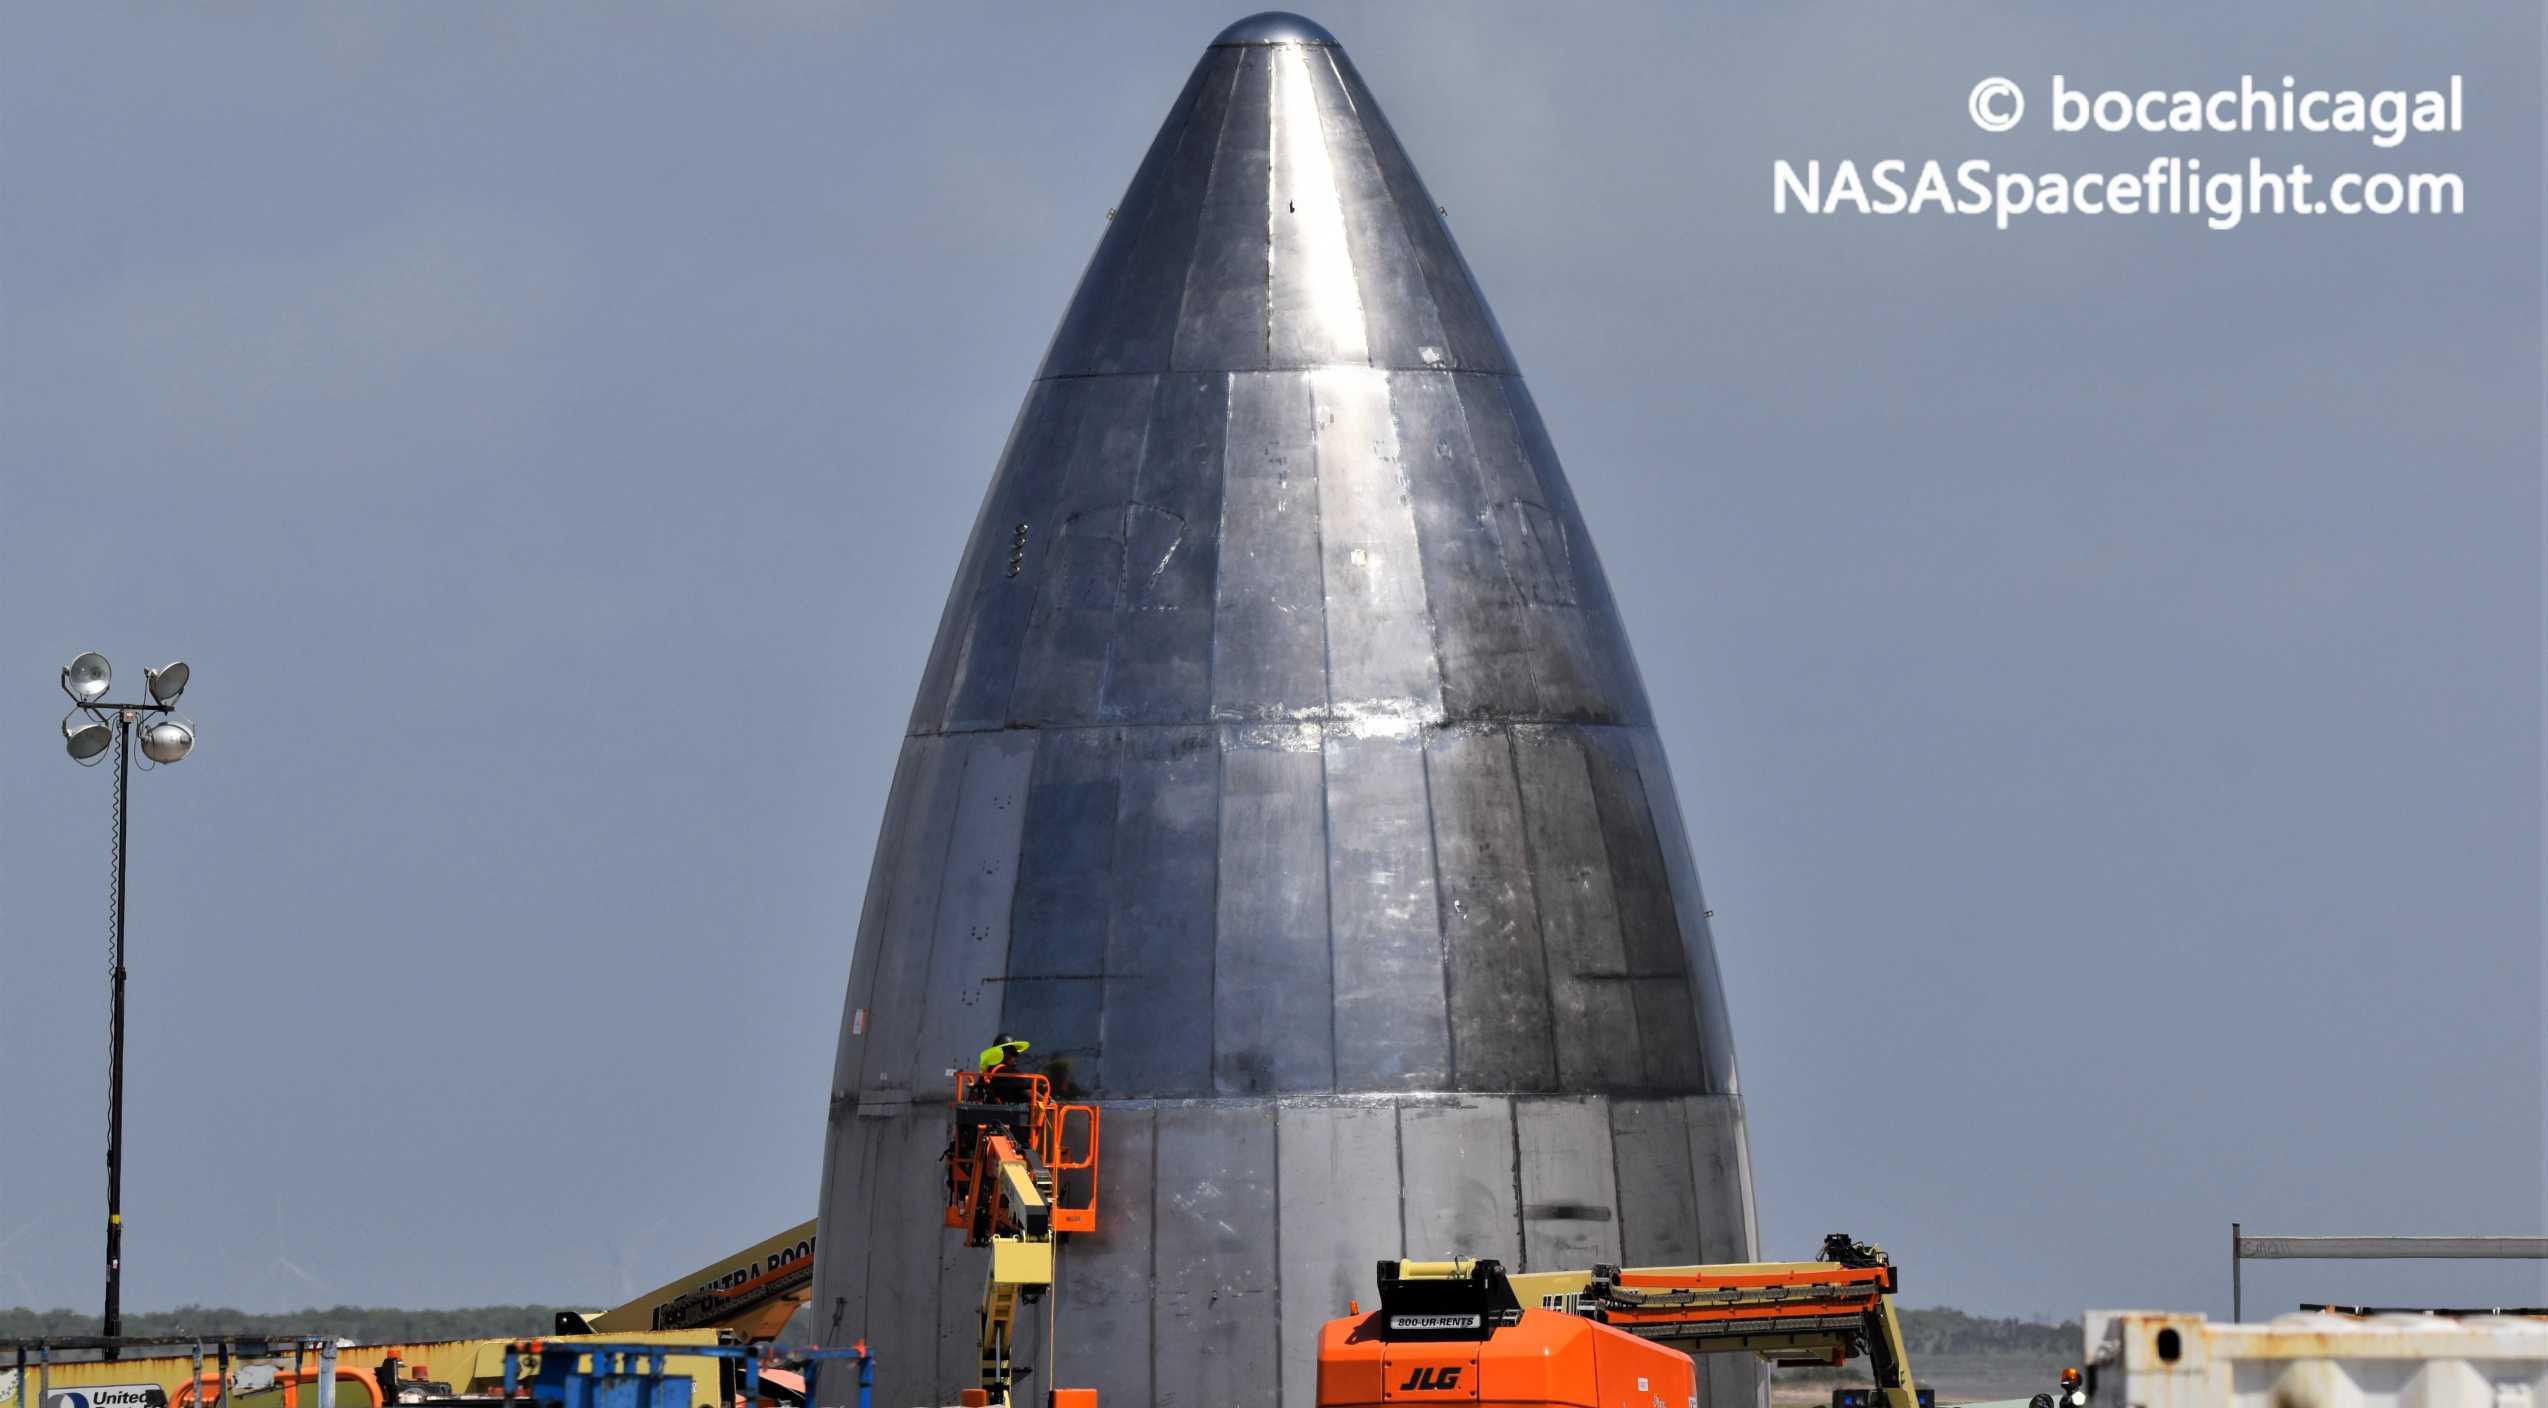 Starship Boca Chica 052320 (NASASpaceflight – bocachicagal) SN5 nose work 2 crop (c)